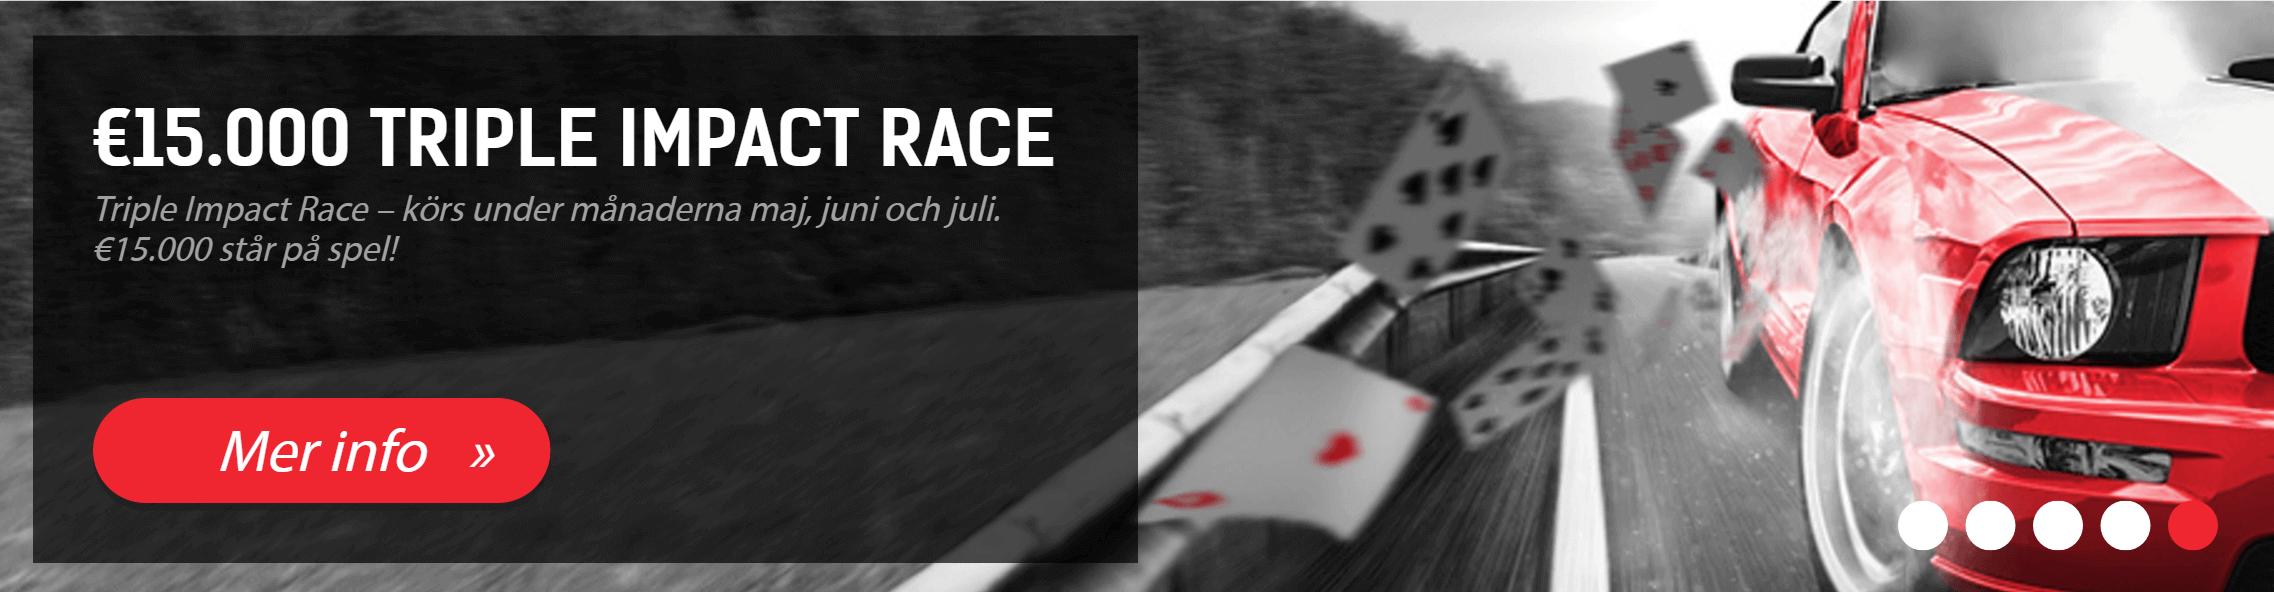 Redbet triple impact race